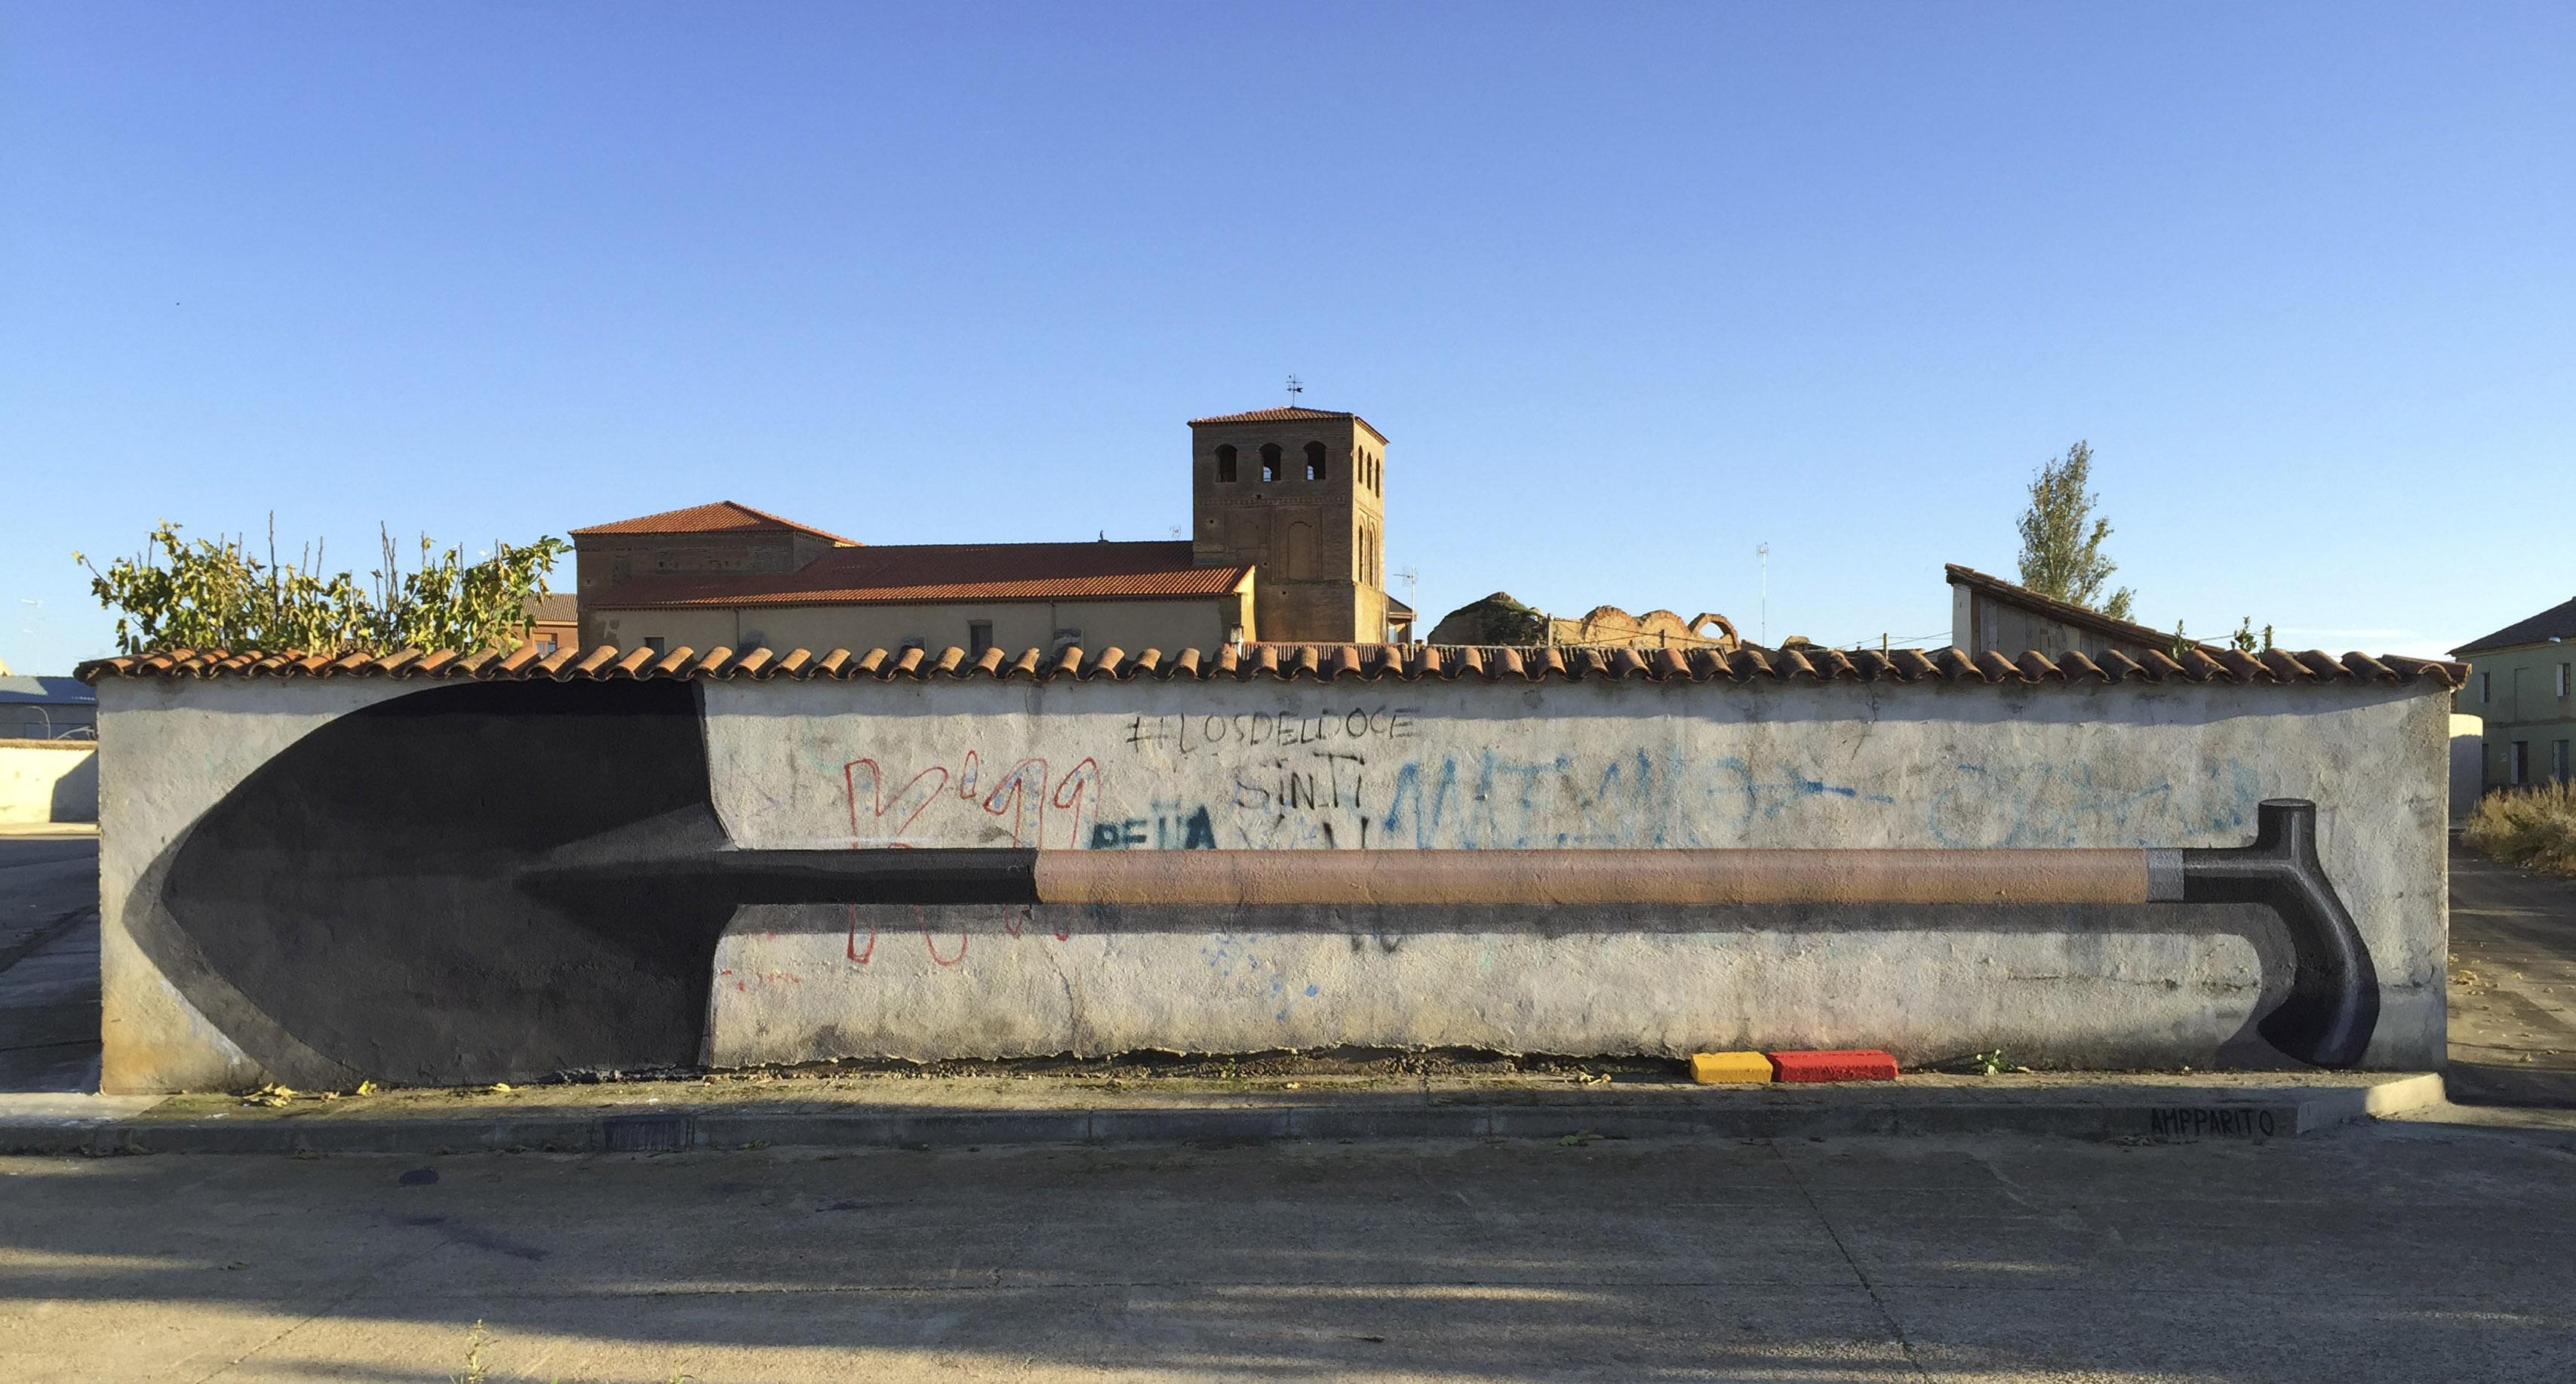 fresque-geante-objet-quotidien-street-art-11